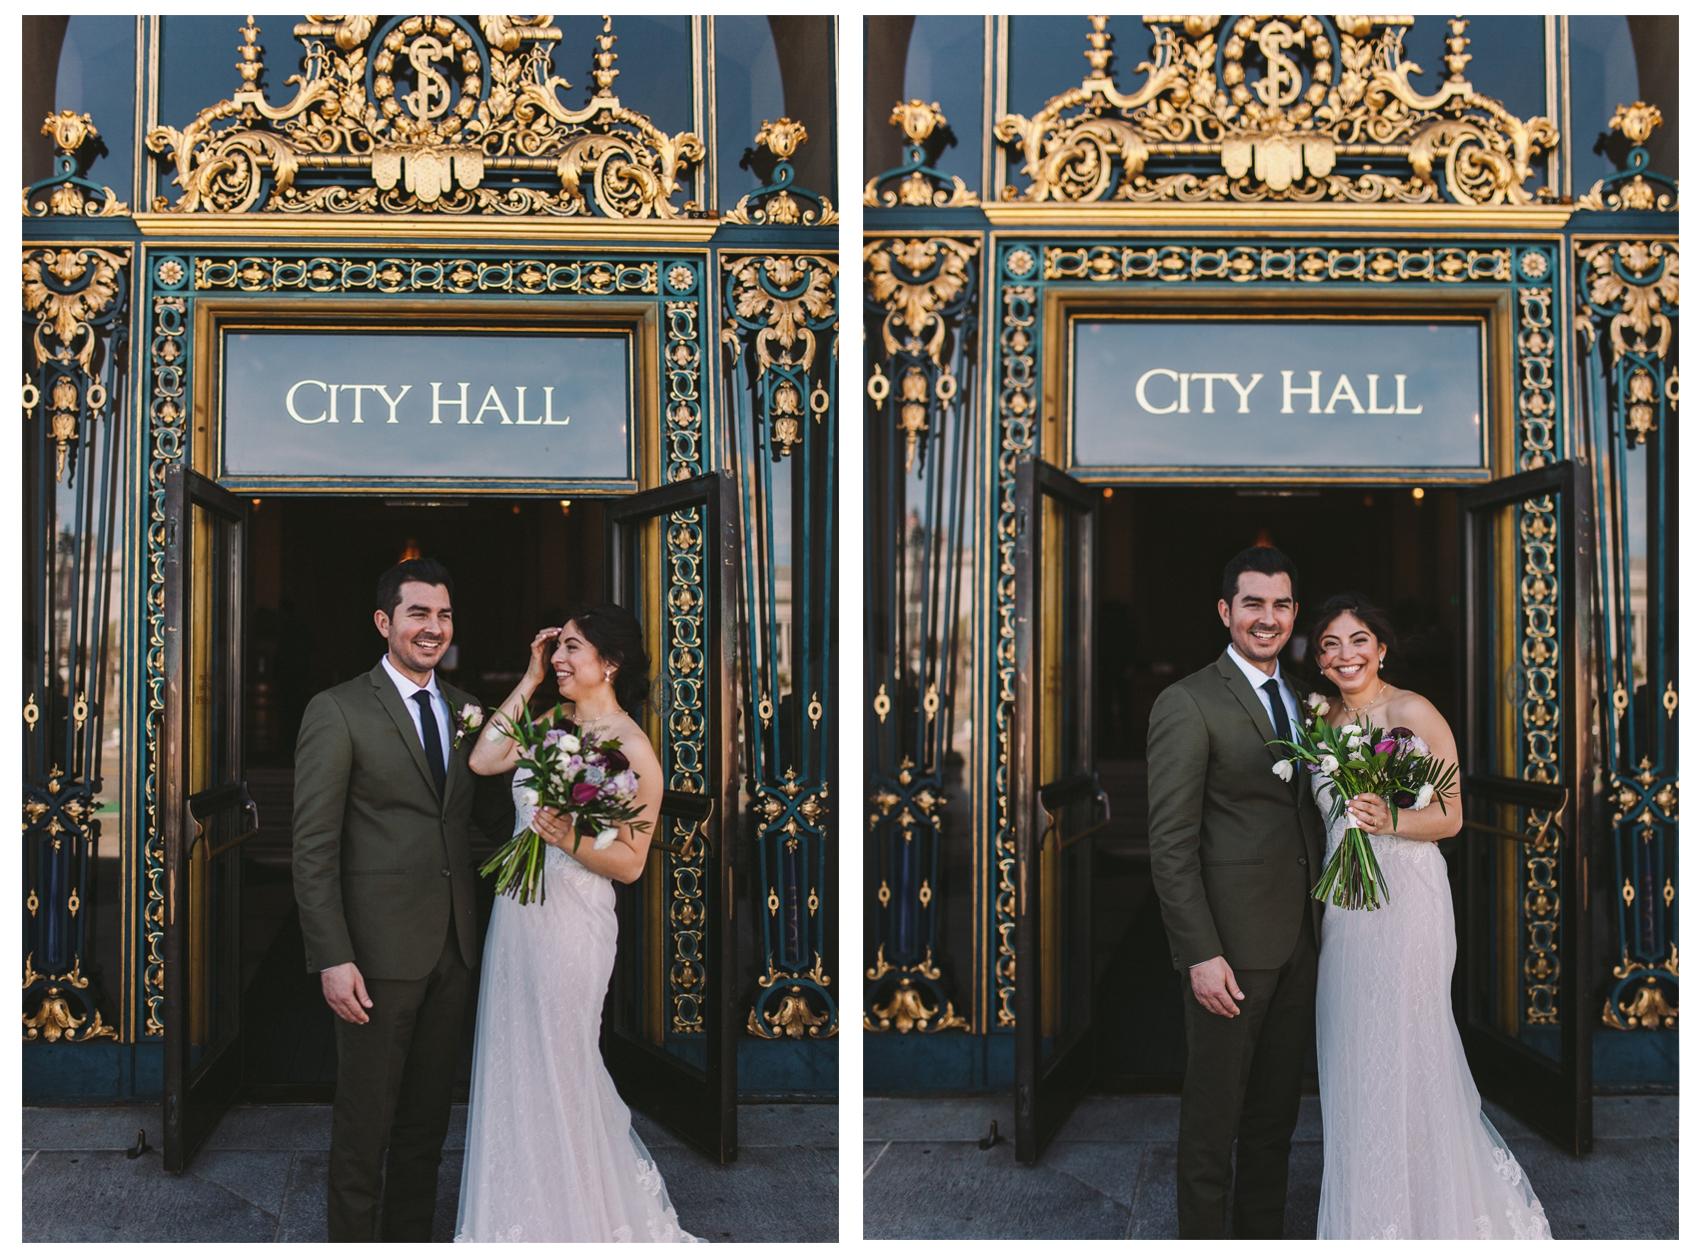 San Francisco City Hall & Stable Cafe Wedding Photography Double 10.jpg